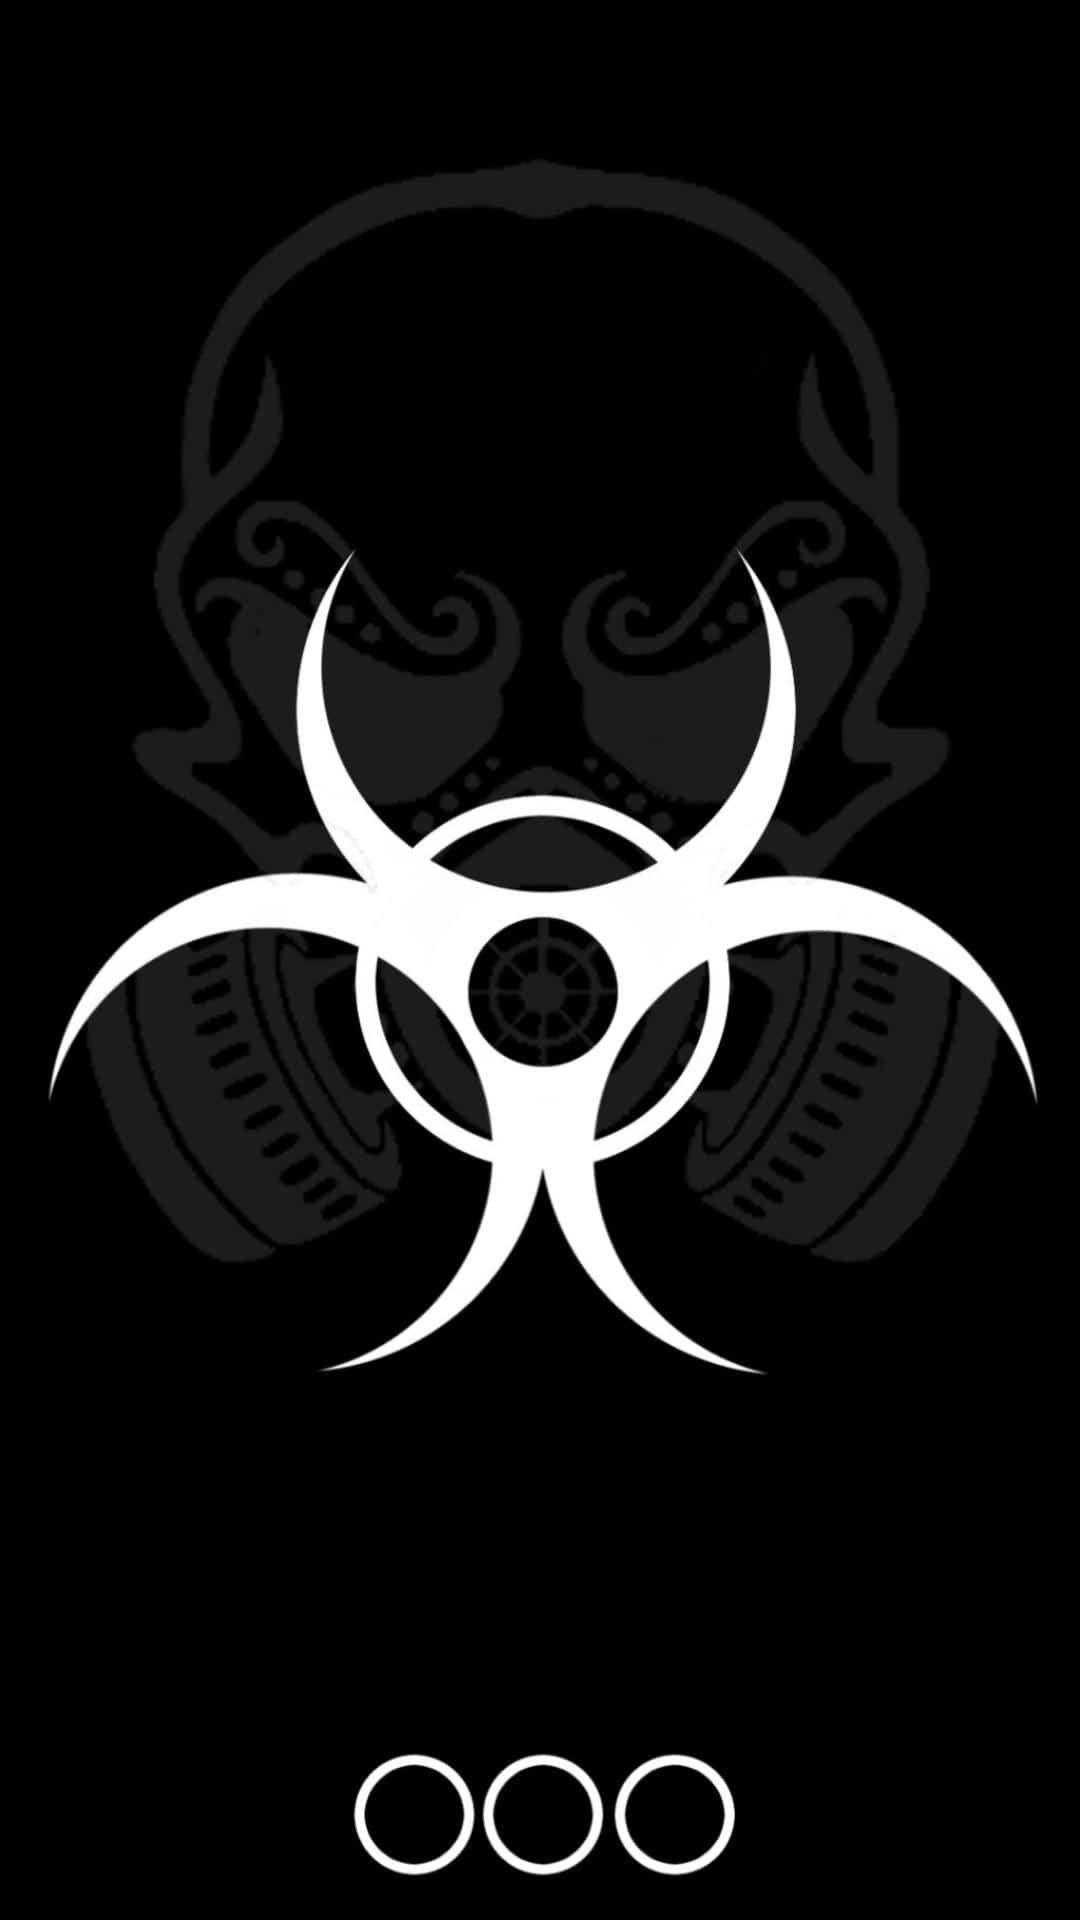 http://wallpaperformobile/17140/biohazard-wallpaper-android.html